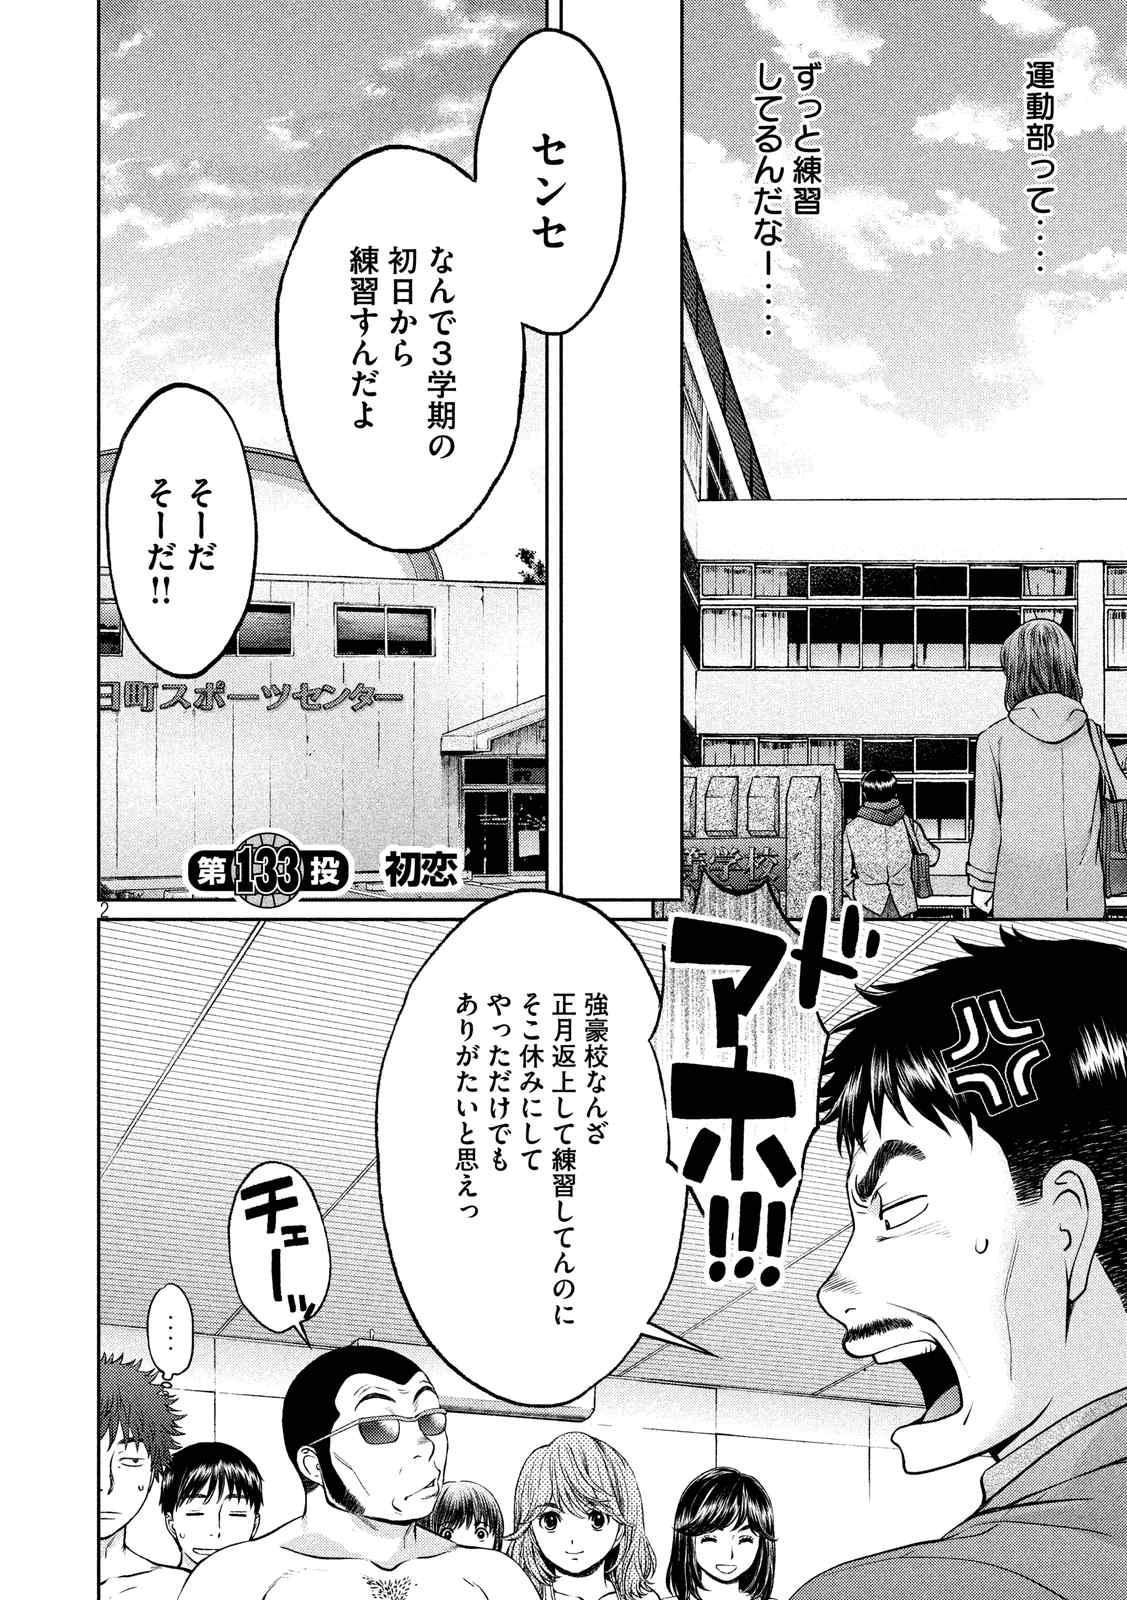 Hantsu x Trash - Chapter 133 - Page 2